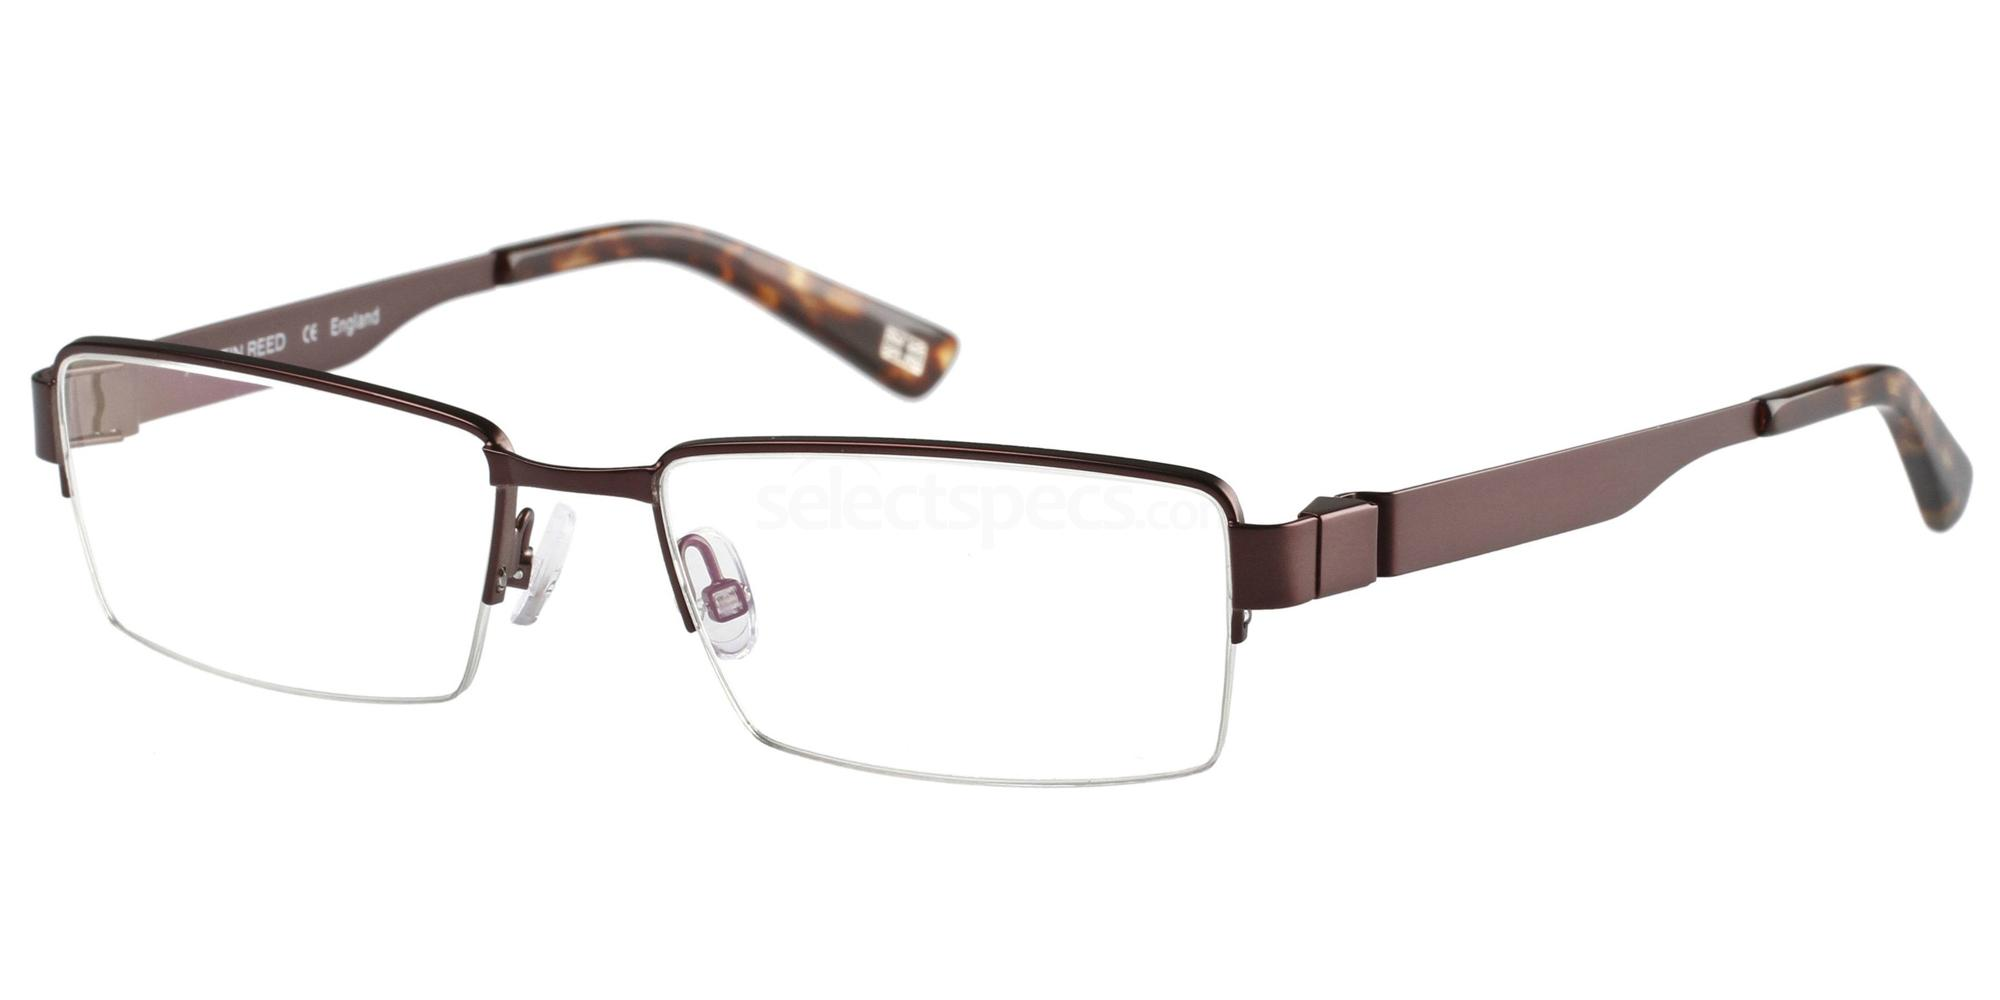 005 AR-M04 Lancaster Glasses, Austin Reed